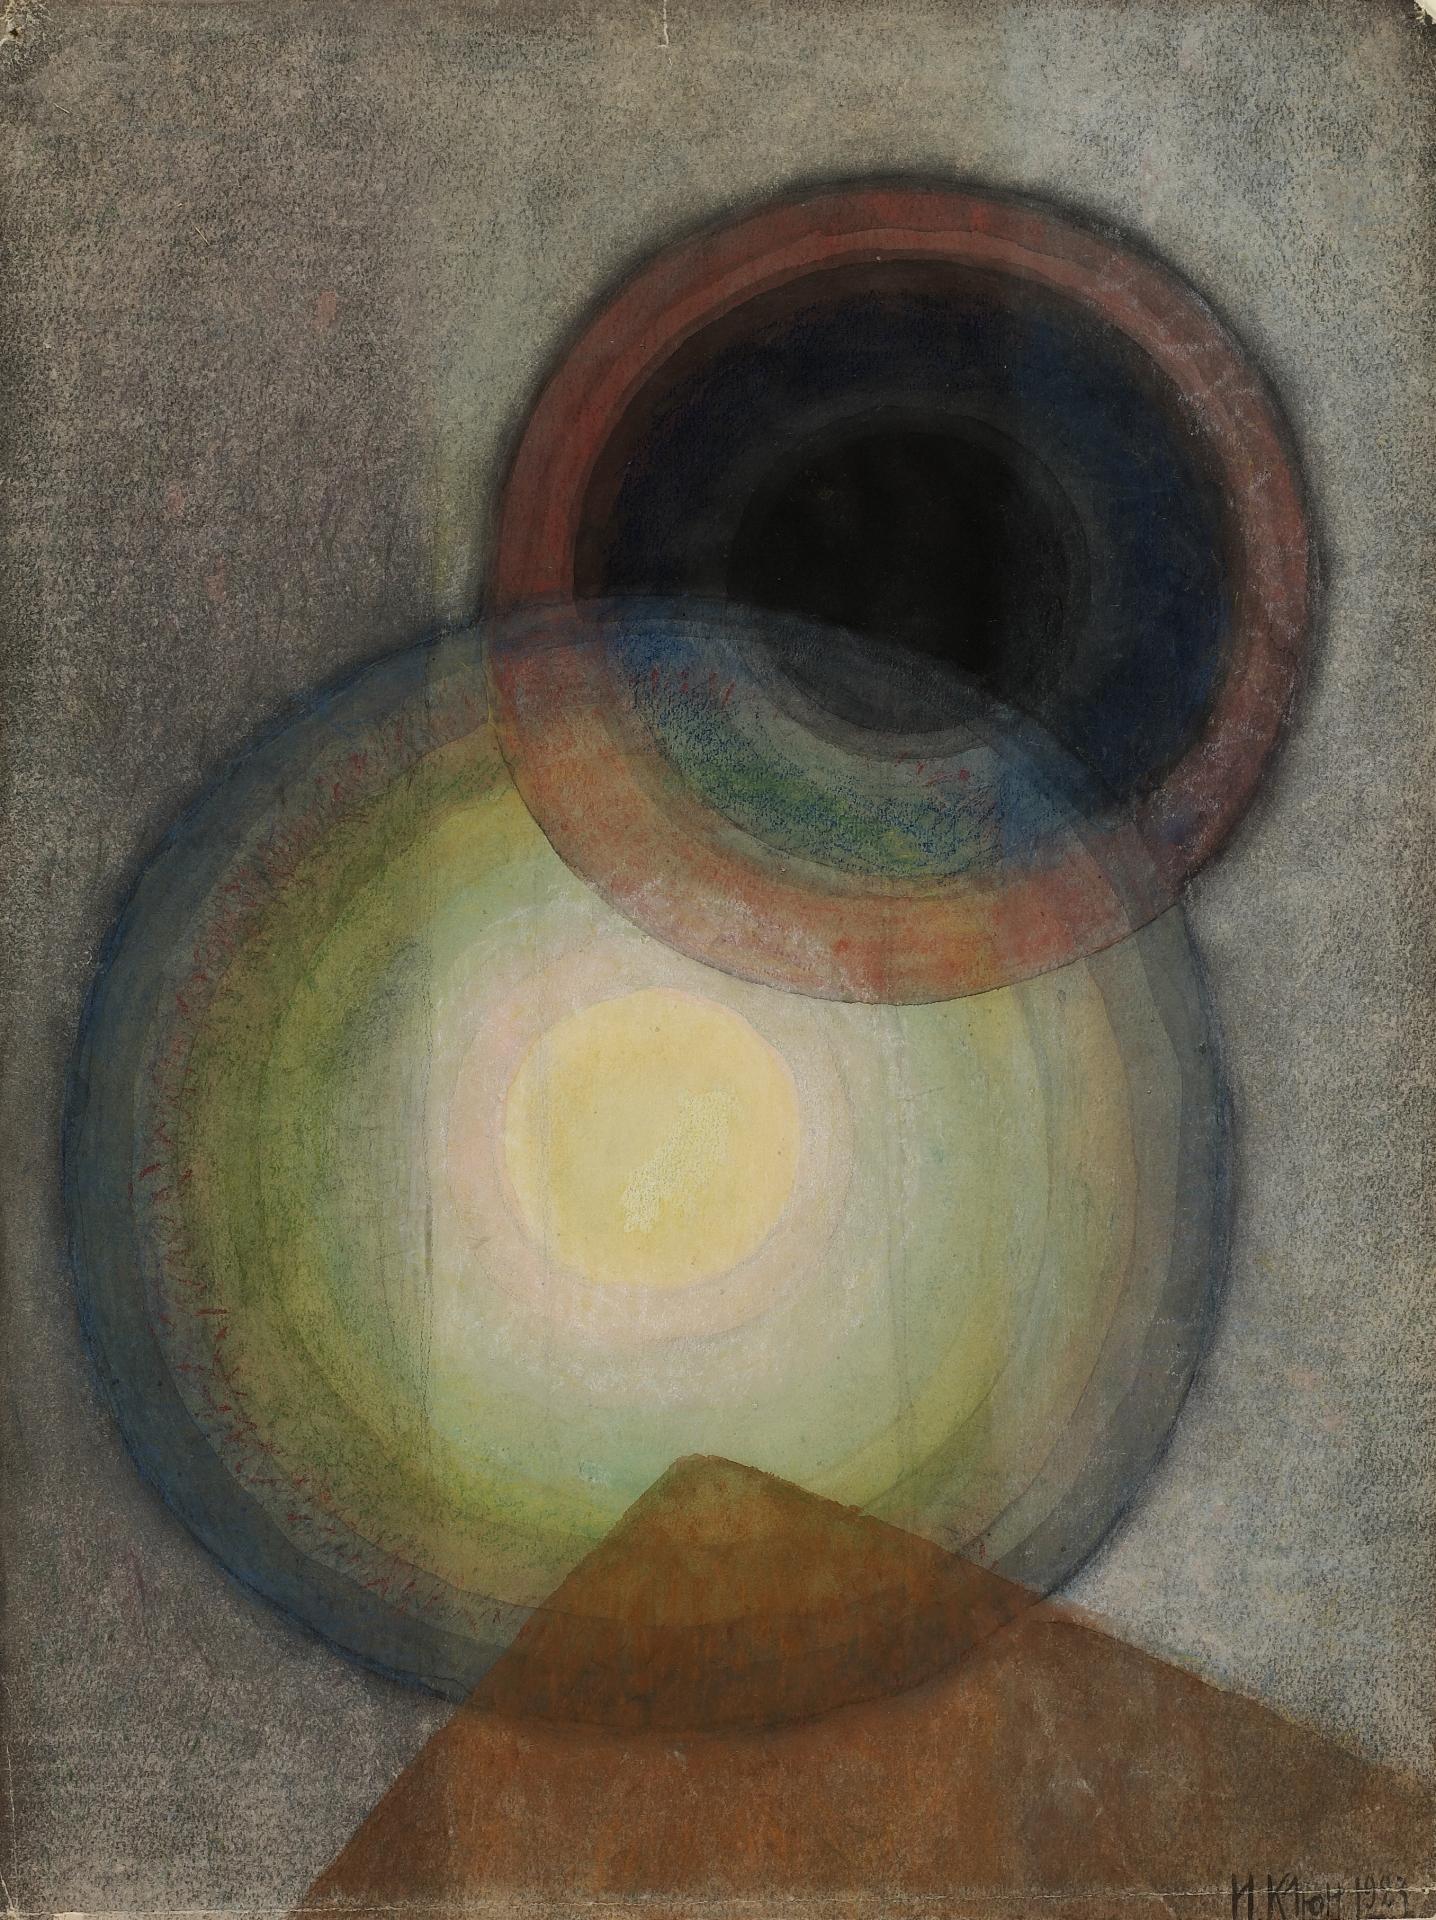 Iwan Klun / / Ivan Kliun, Bez tytułu, 1927